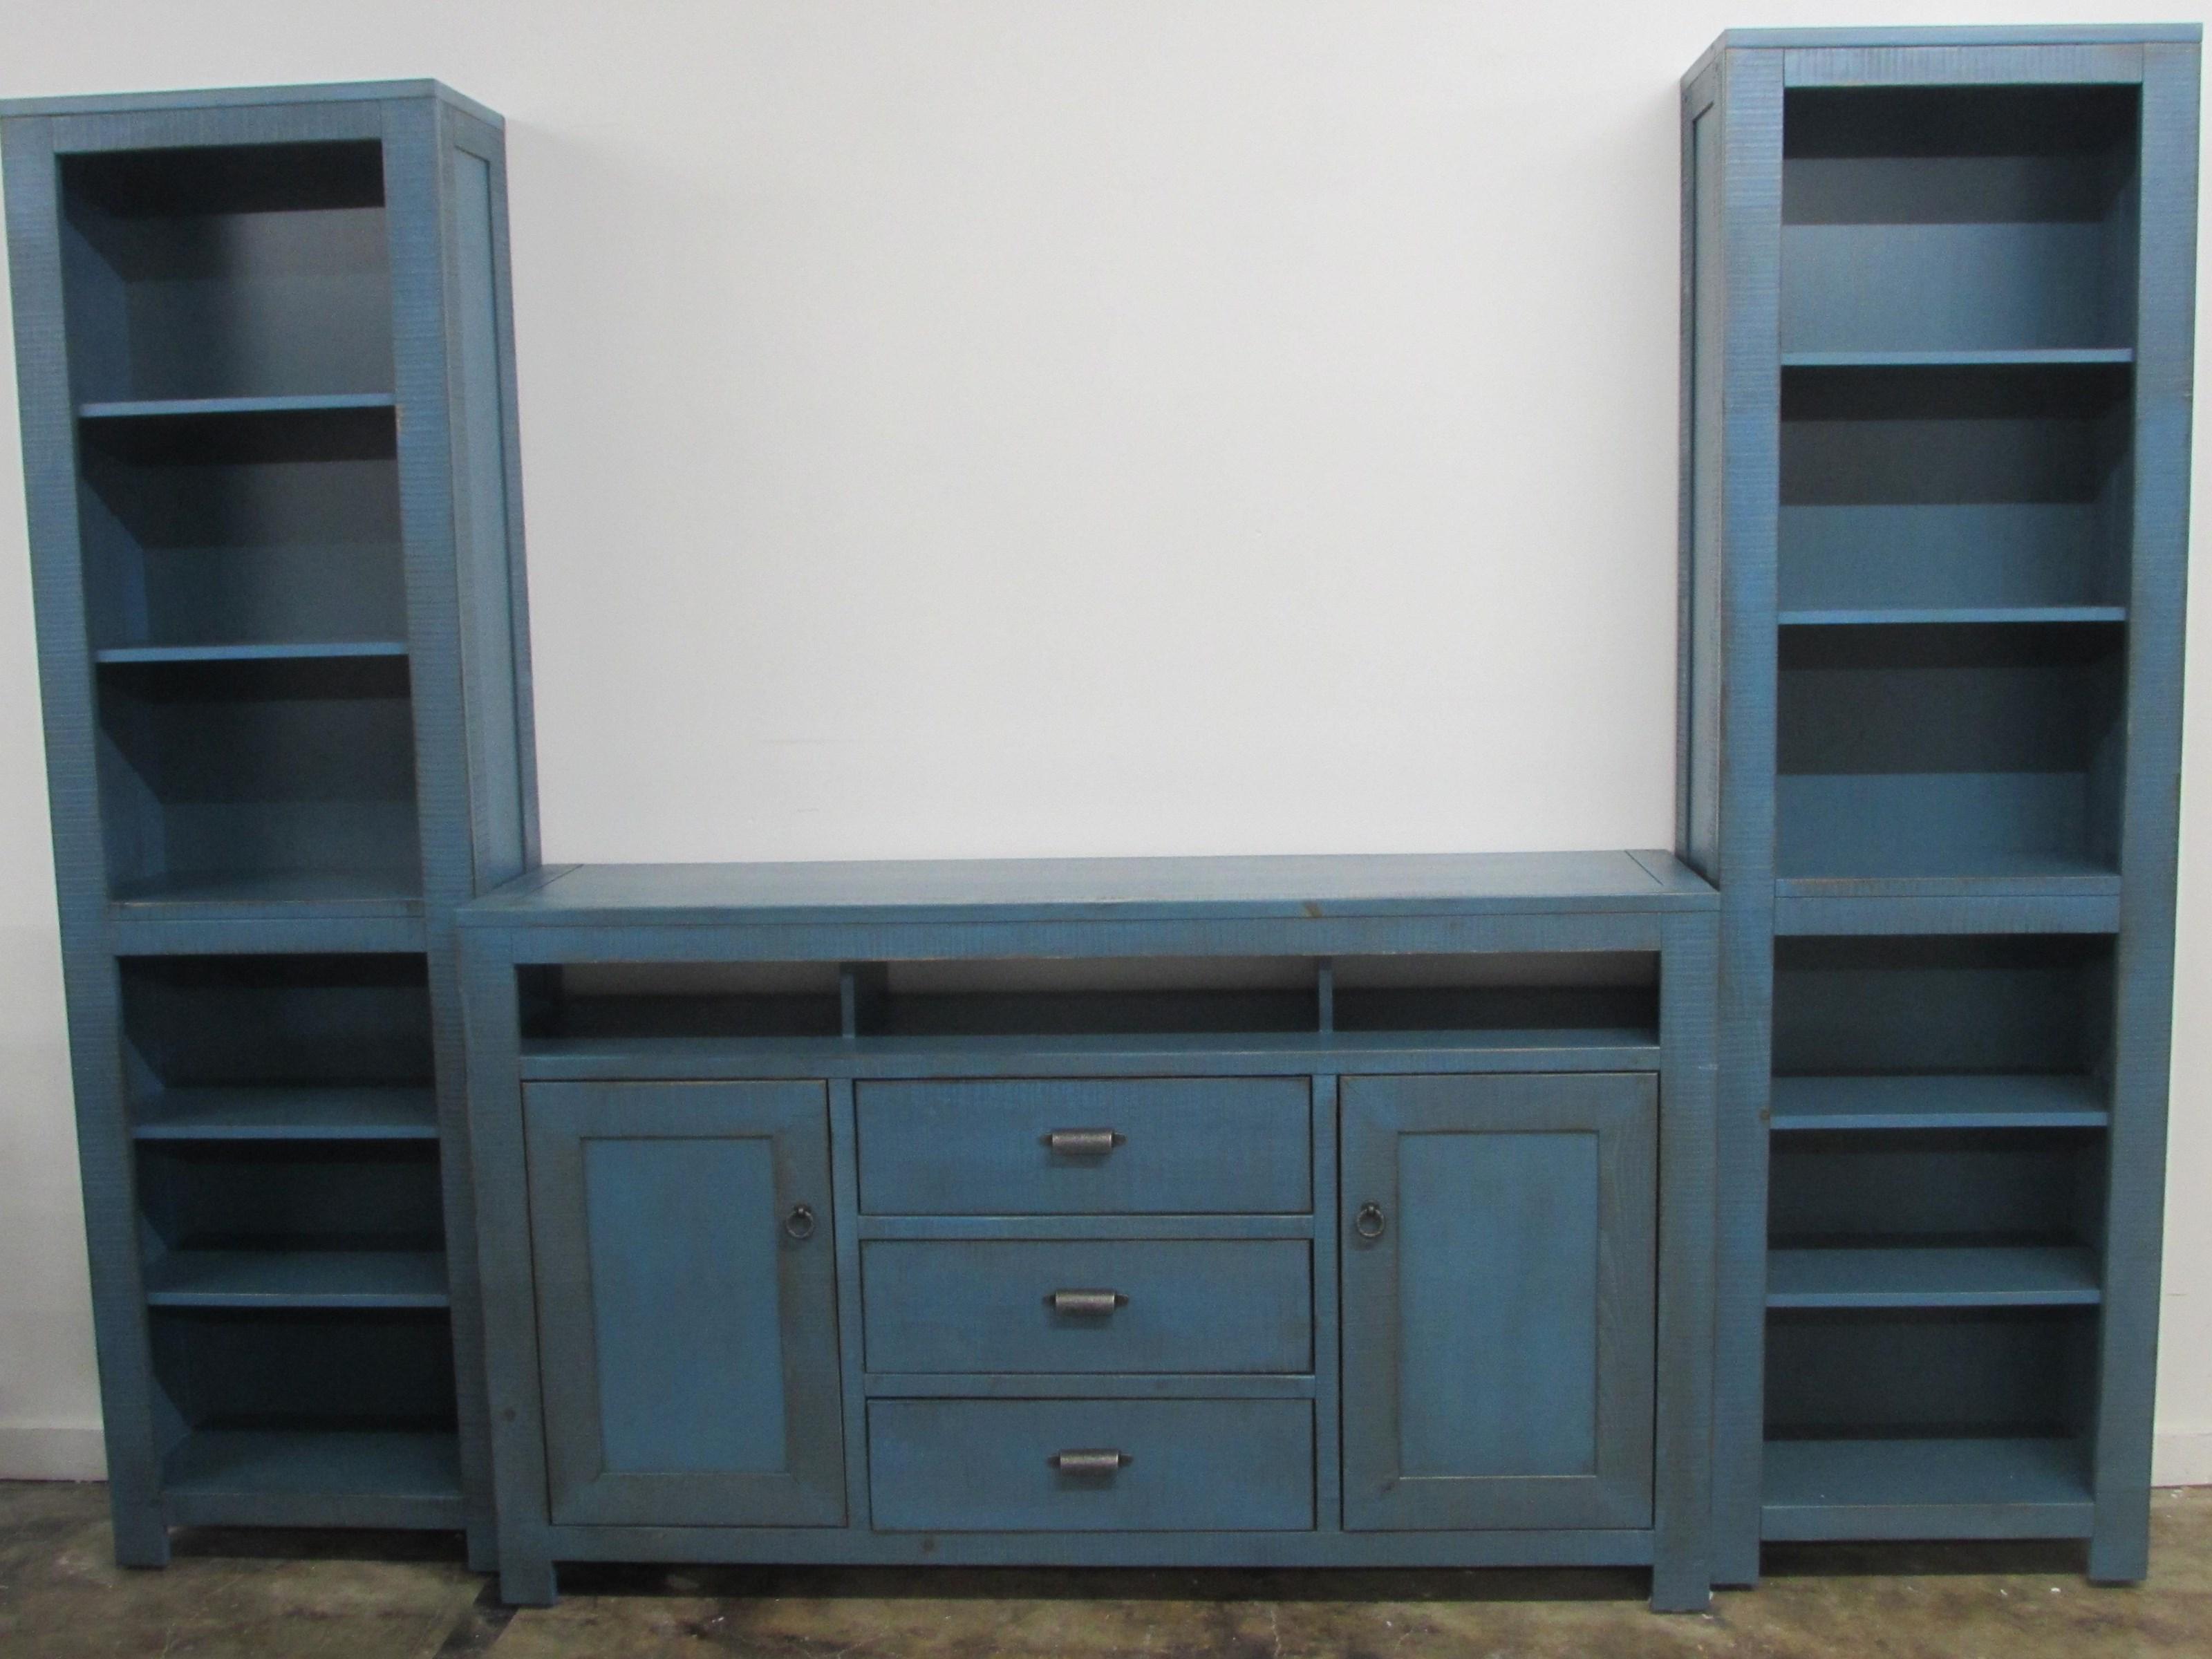 Oak Furniture West 6149BL Wall Unit